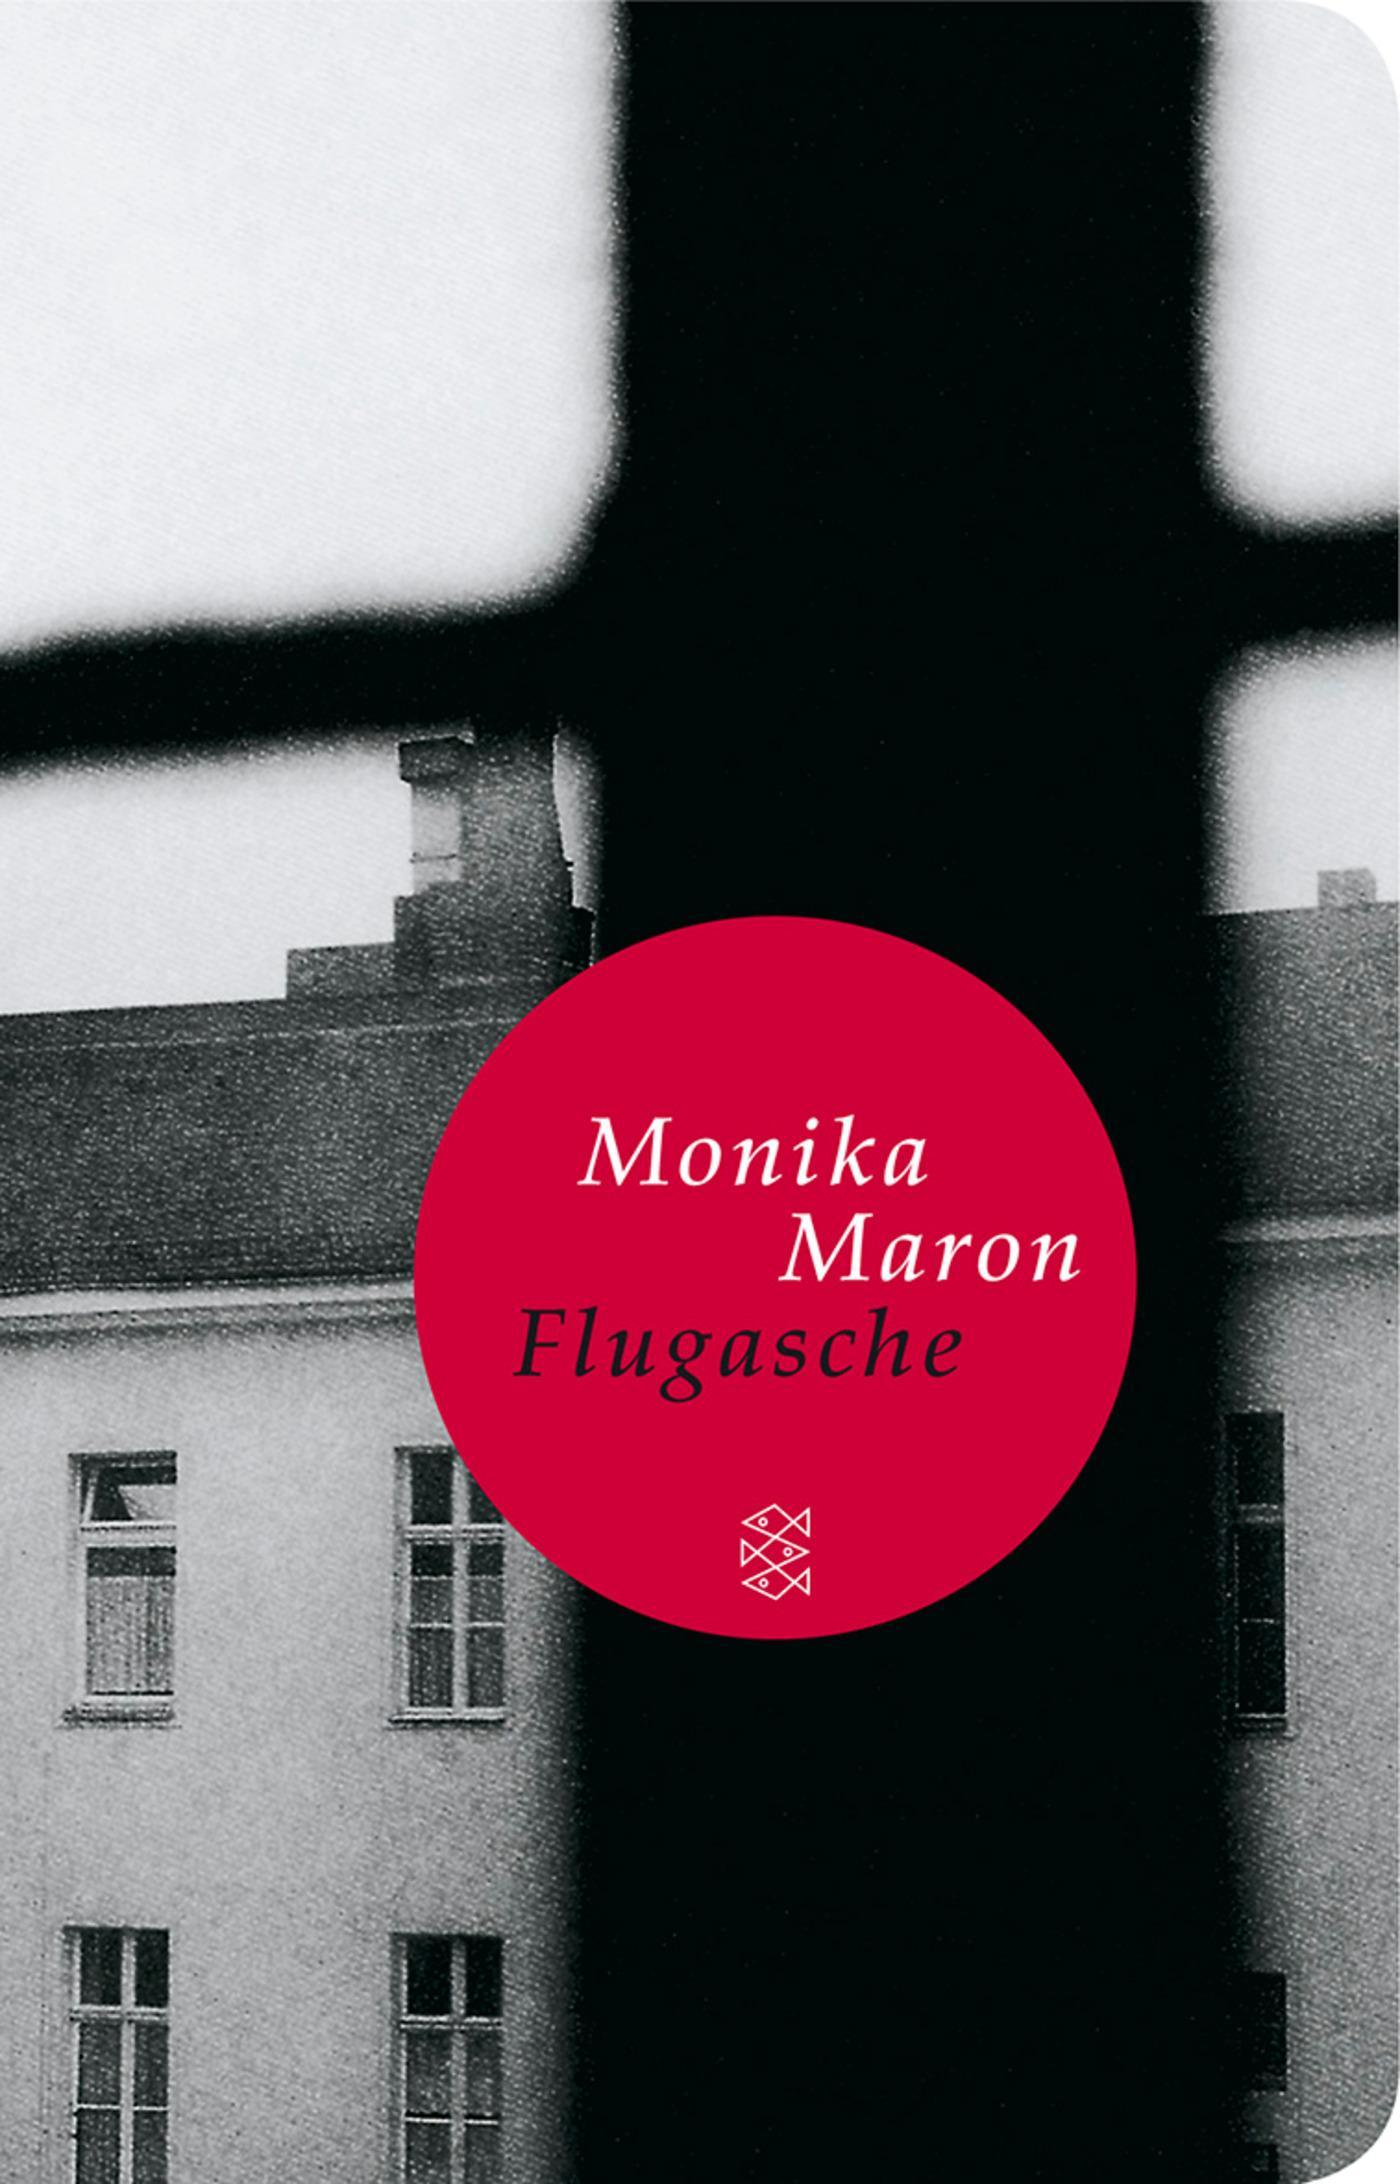 Flugasche - Monika Maron